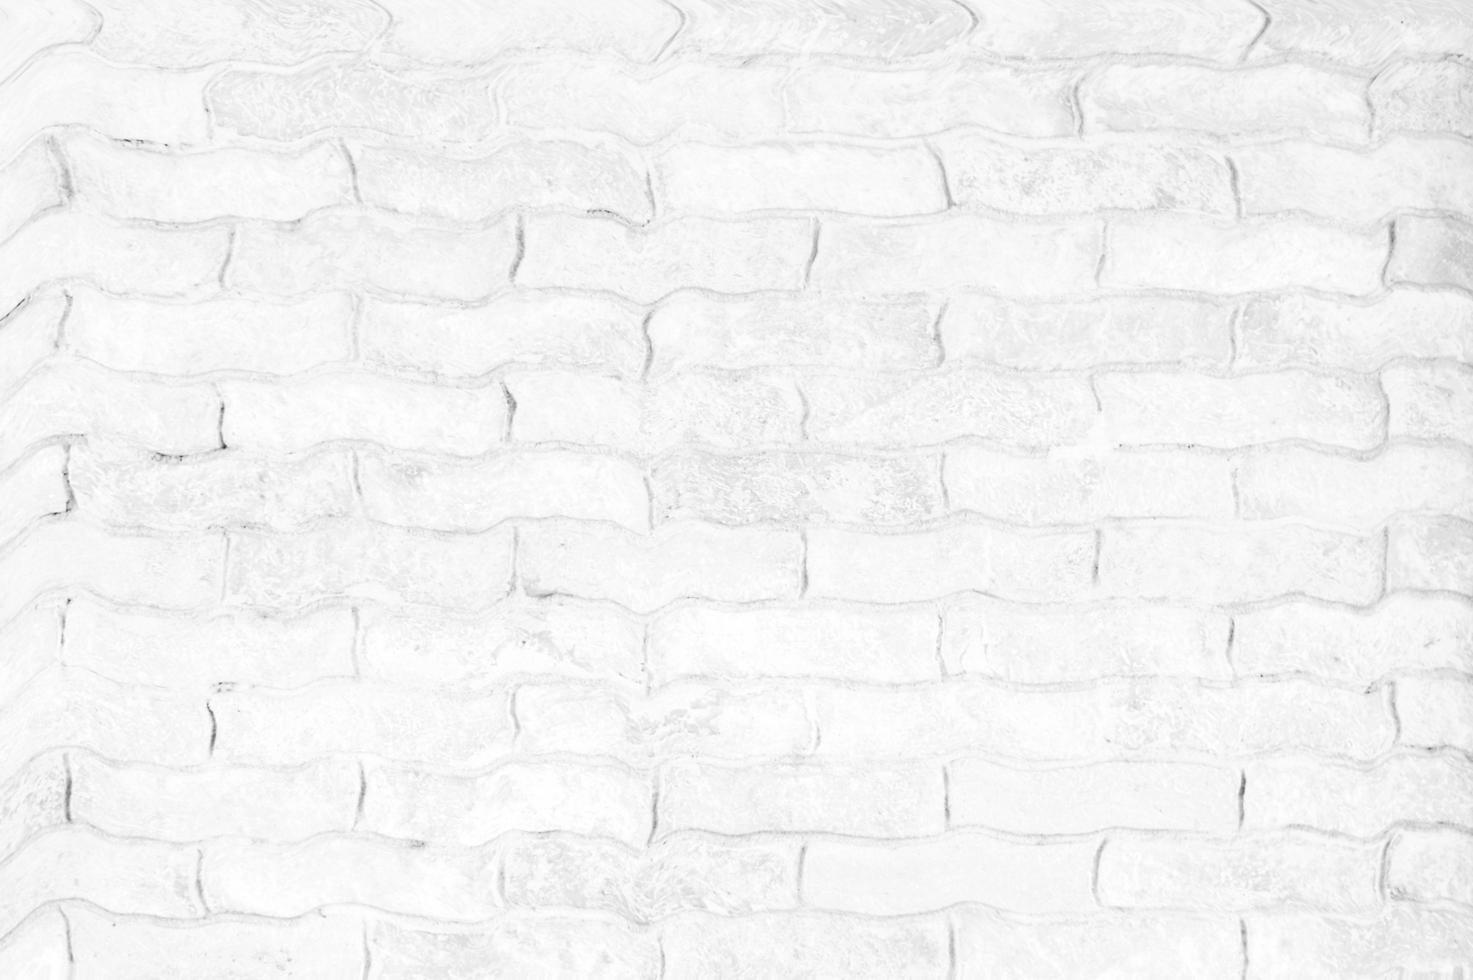 superficie de ladrillo blanco foto